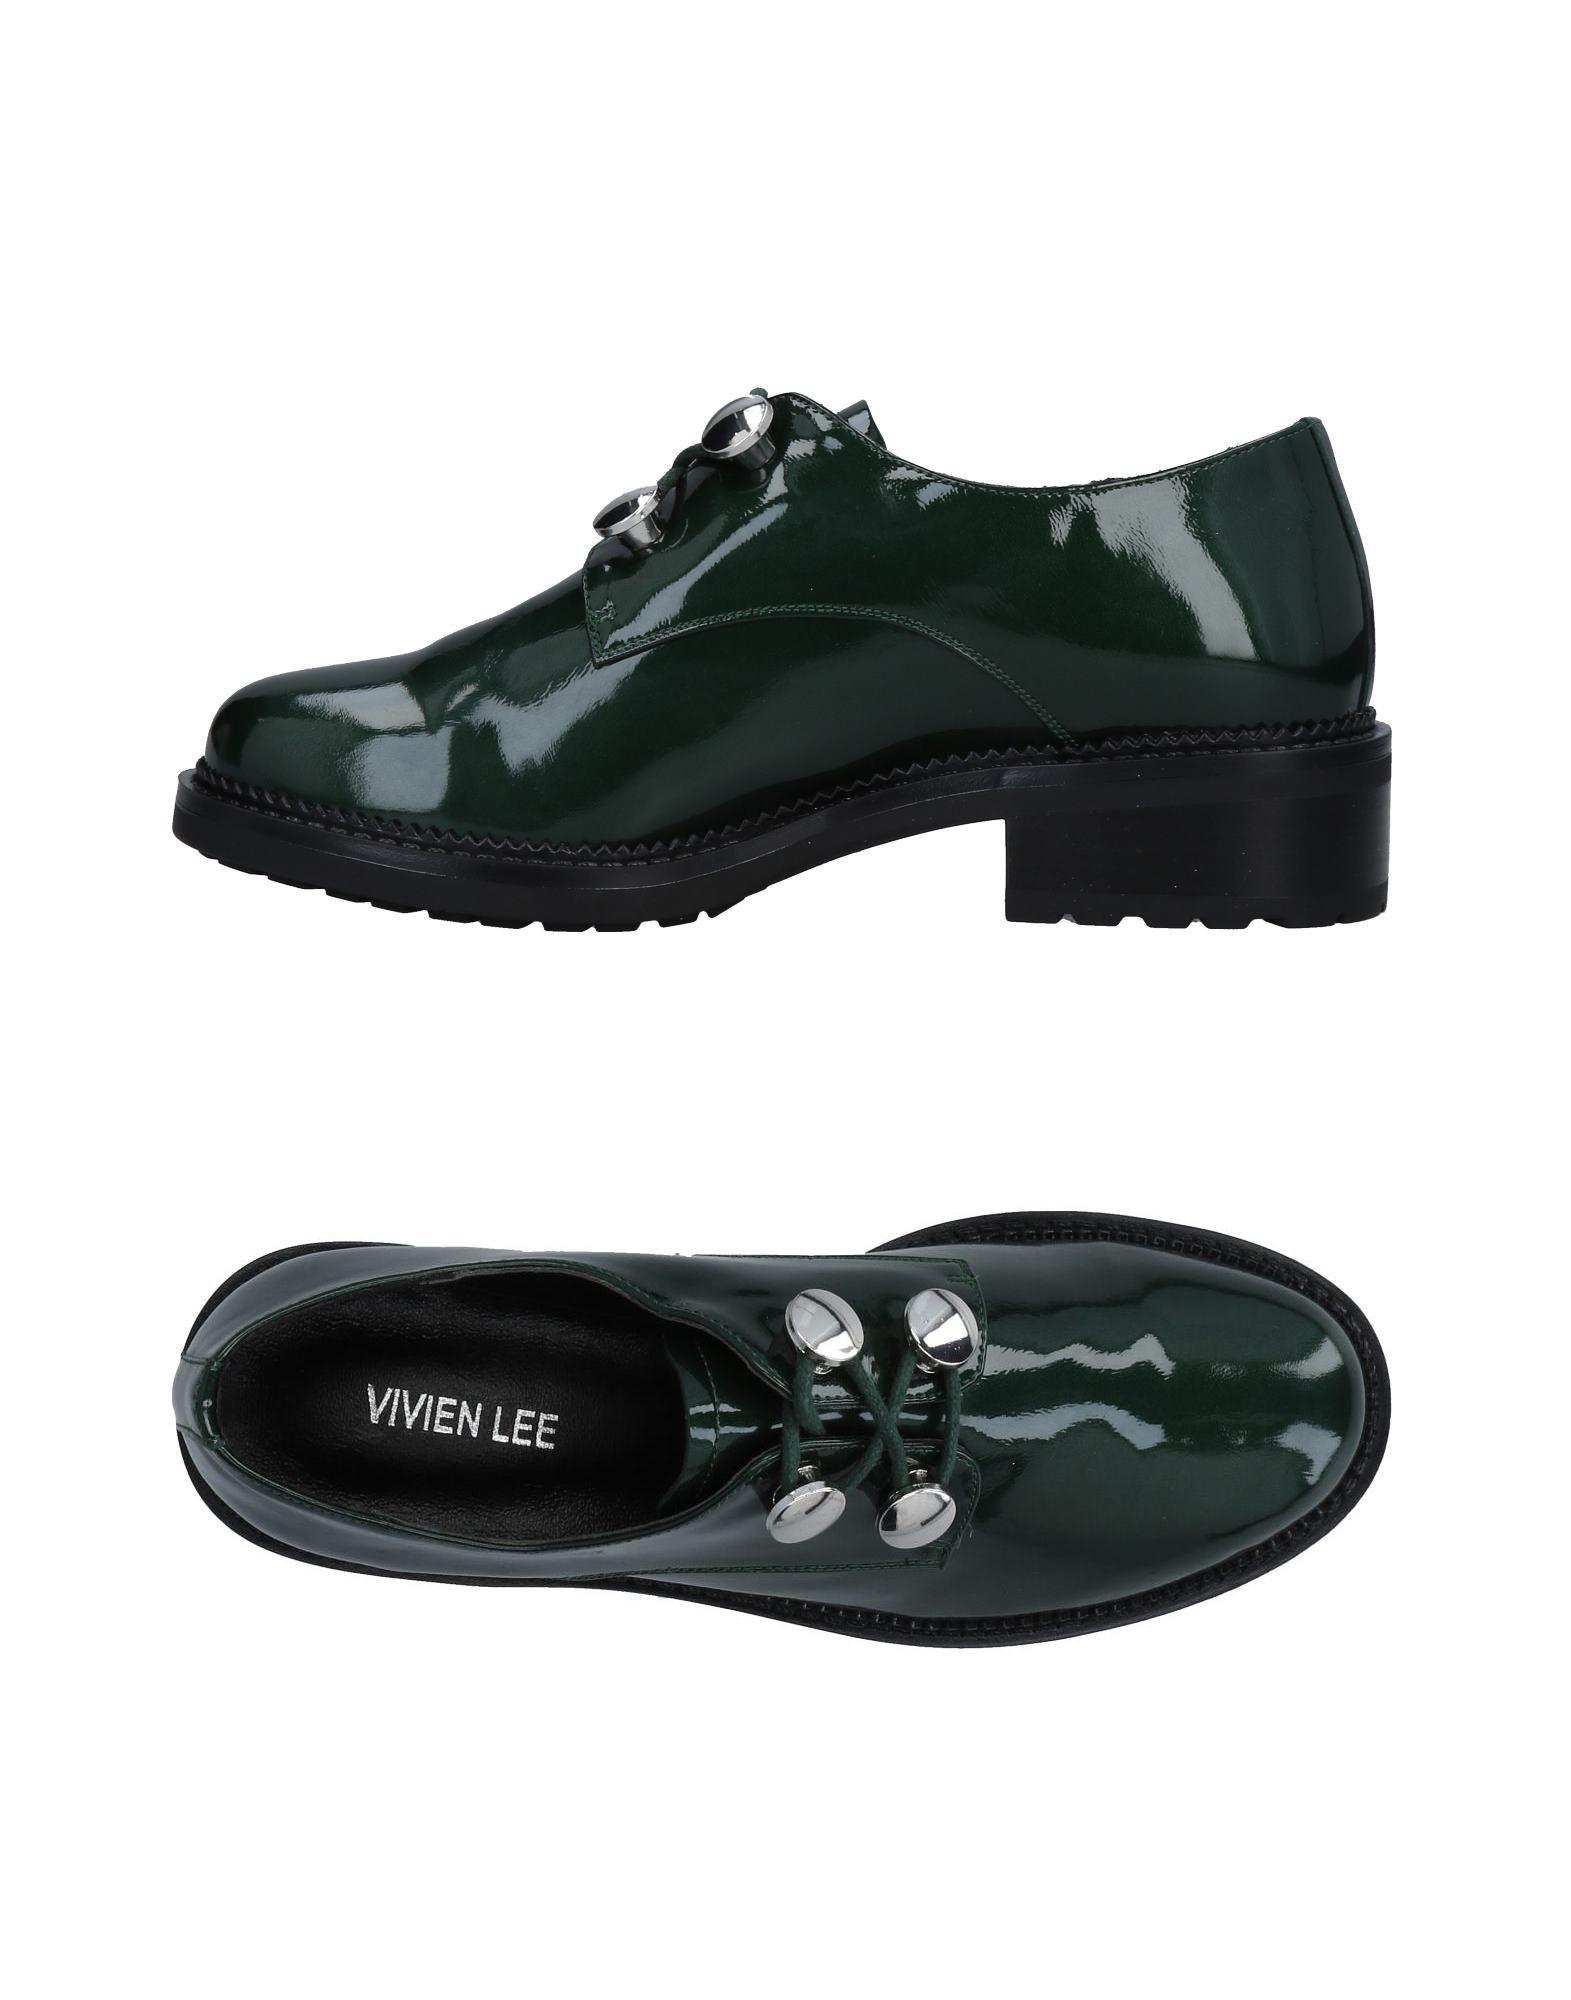 Vivien Lee Schnürschuhe Damen  11491641TC Gute Qualität beliebte Schuhe